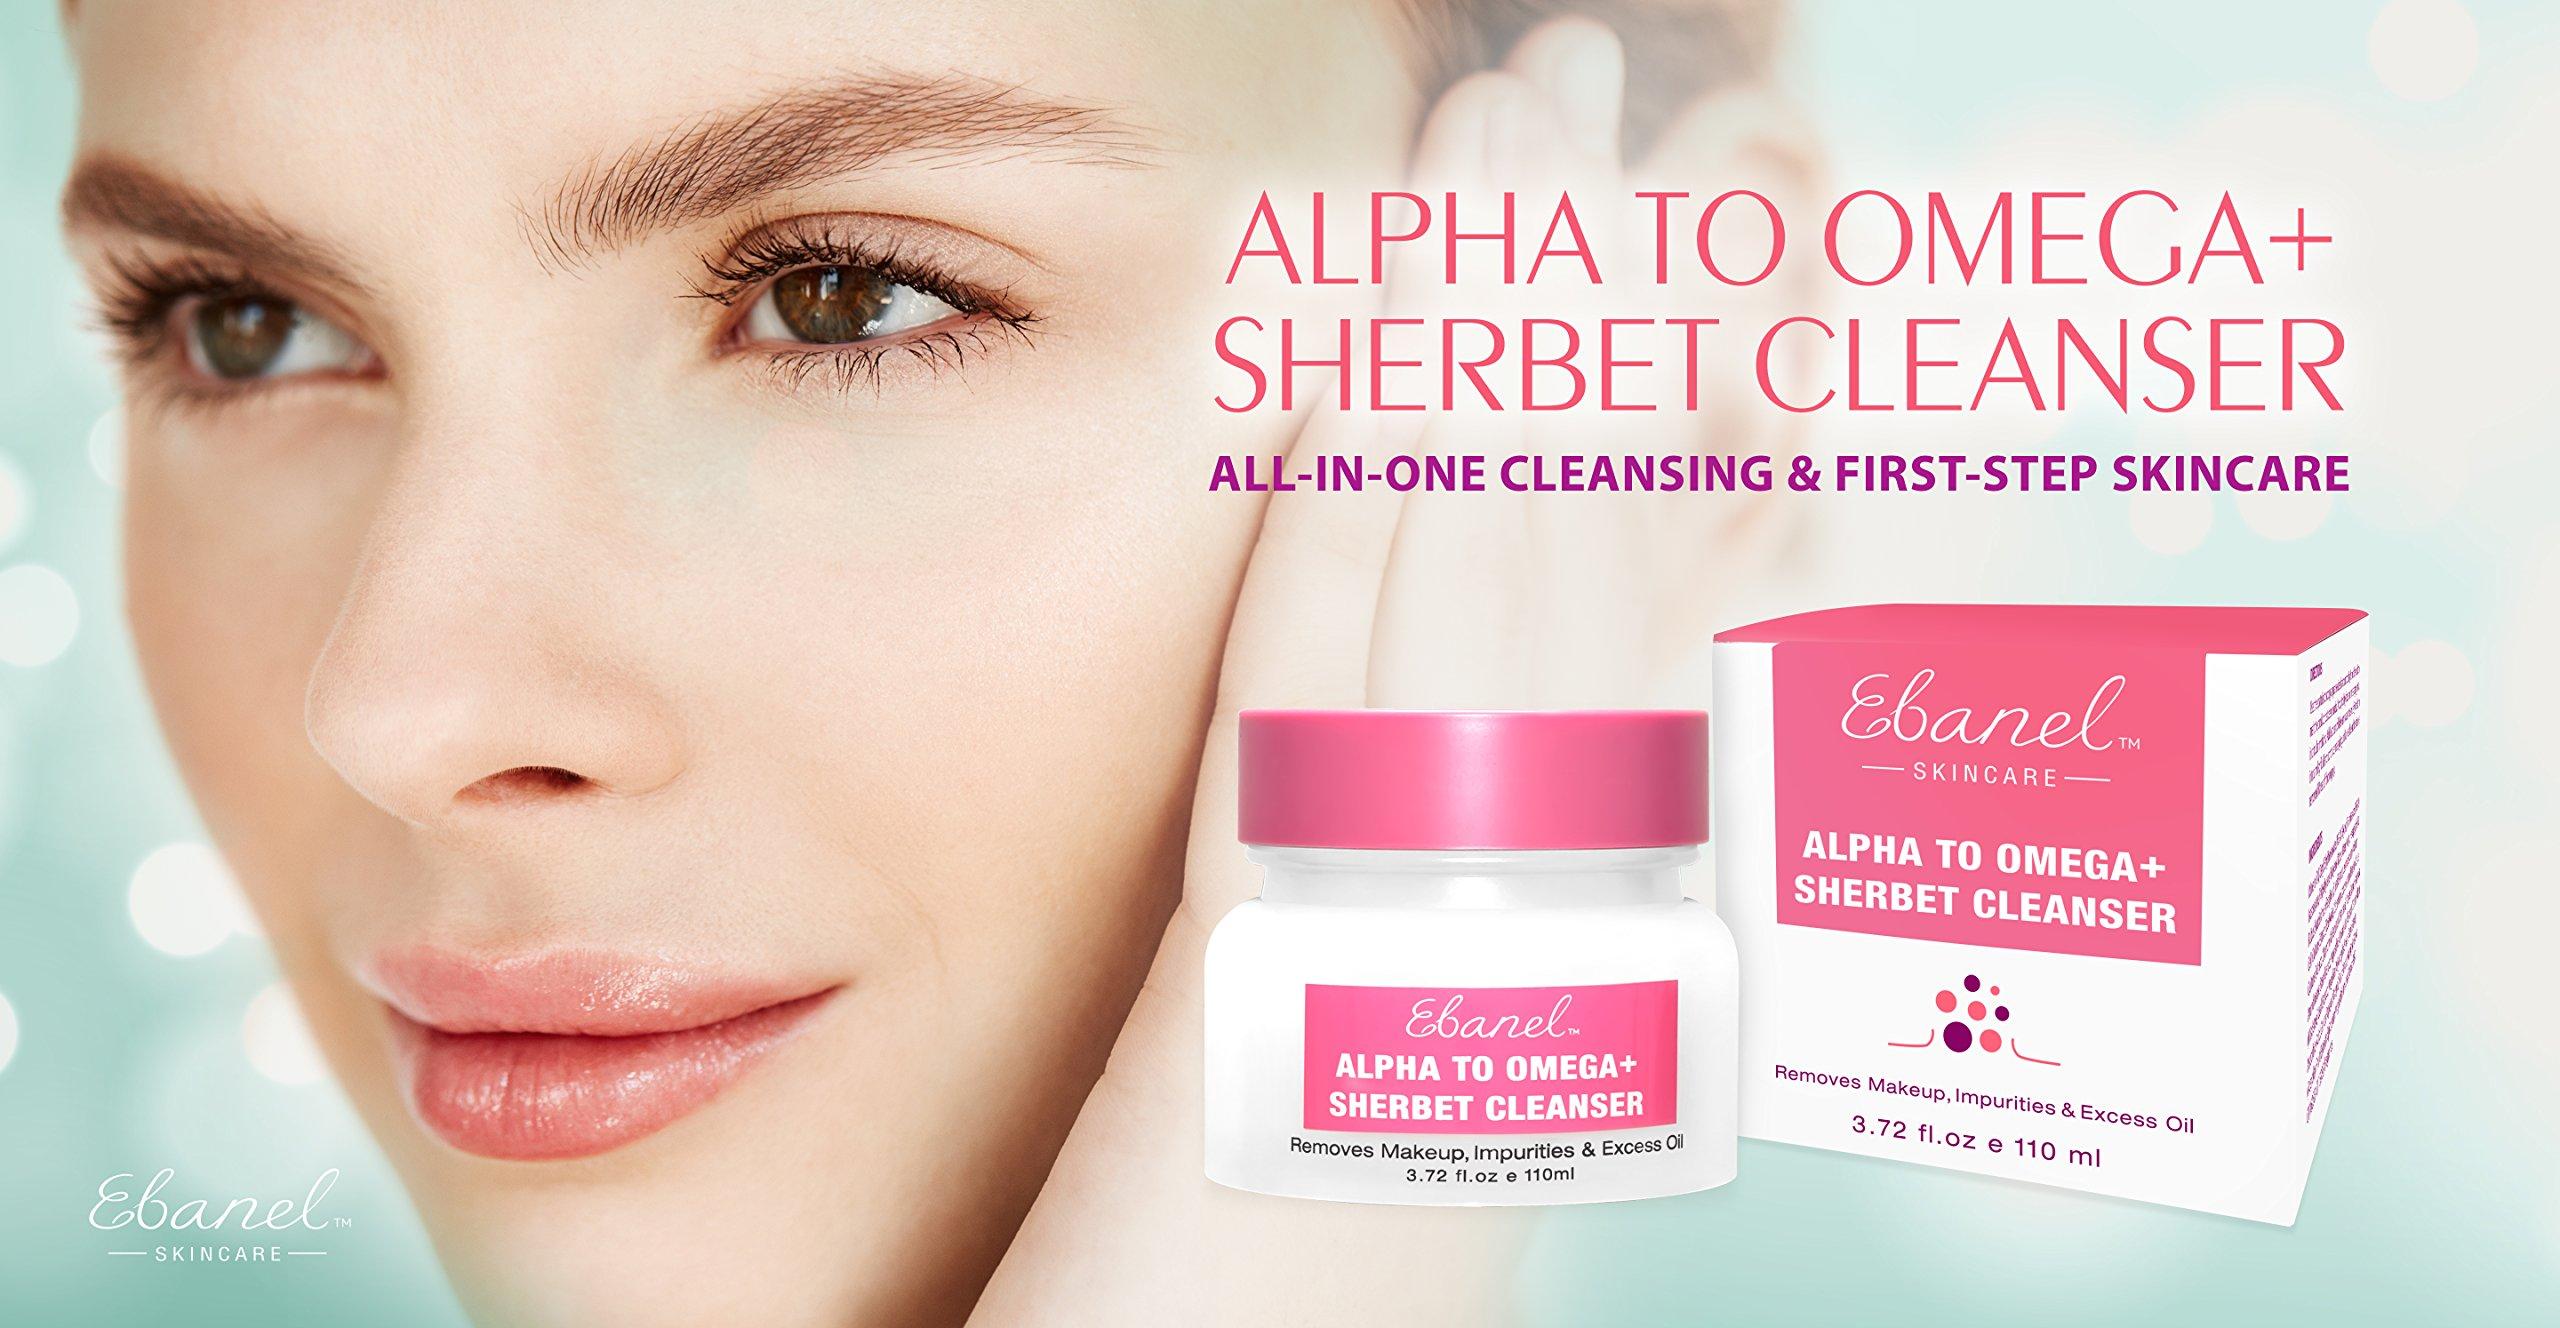 Ebanel Alpha to Omega+ Sherbet Stem Cell Cleanser (Cleansing Balm) (110ml) by Ebanel Laboratories (Image #9)